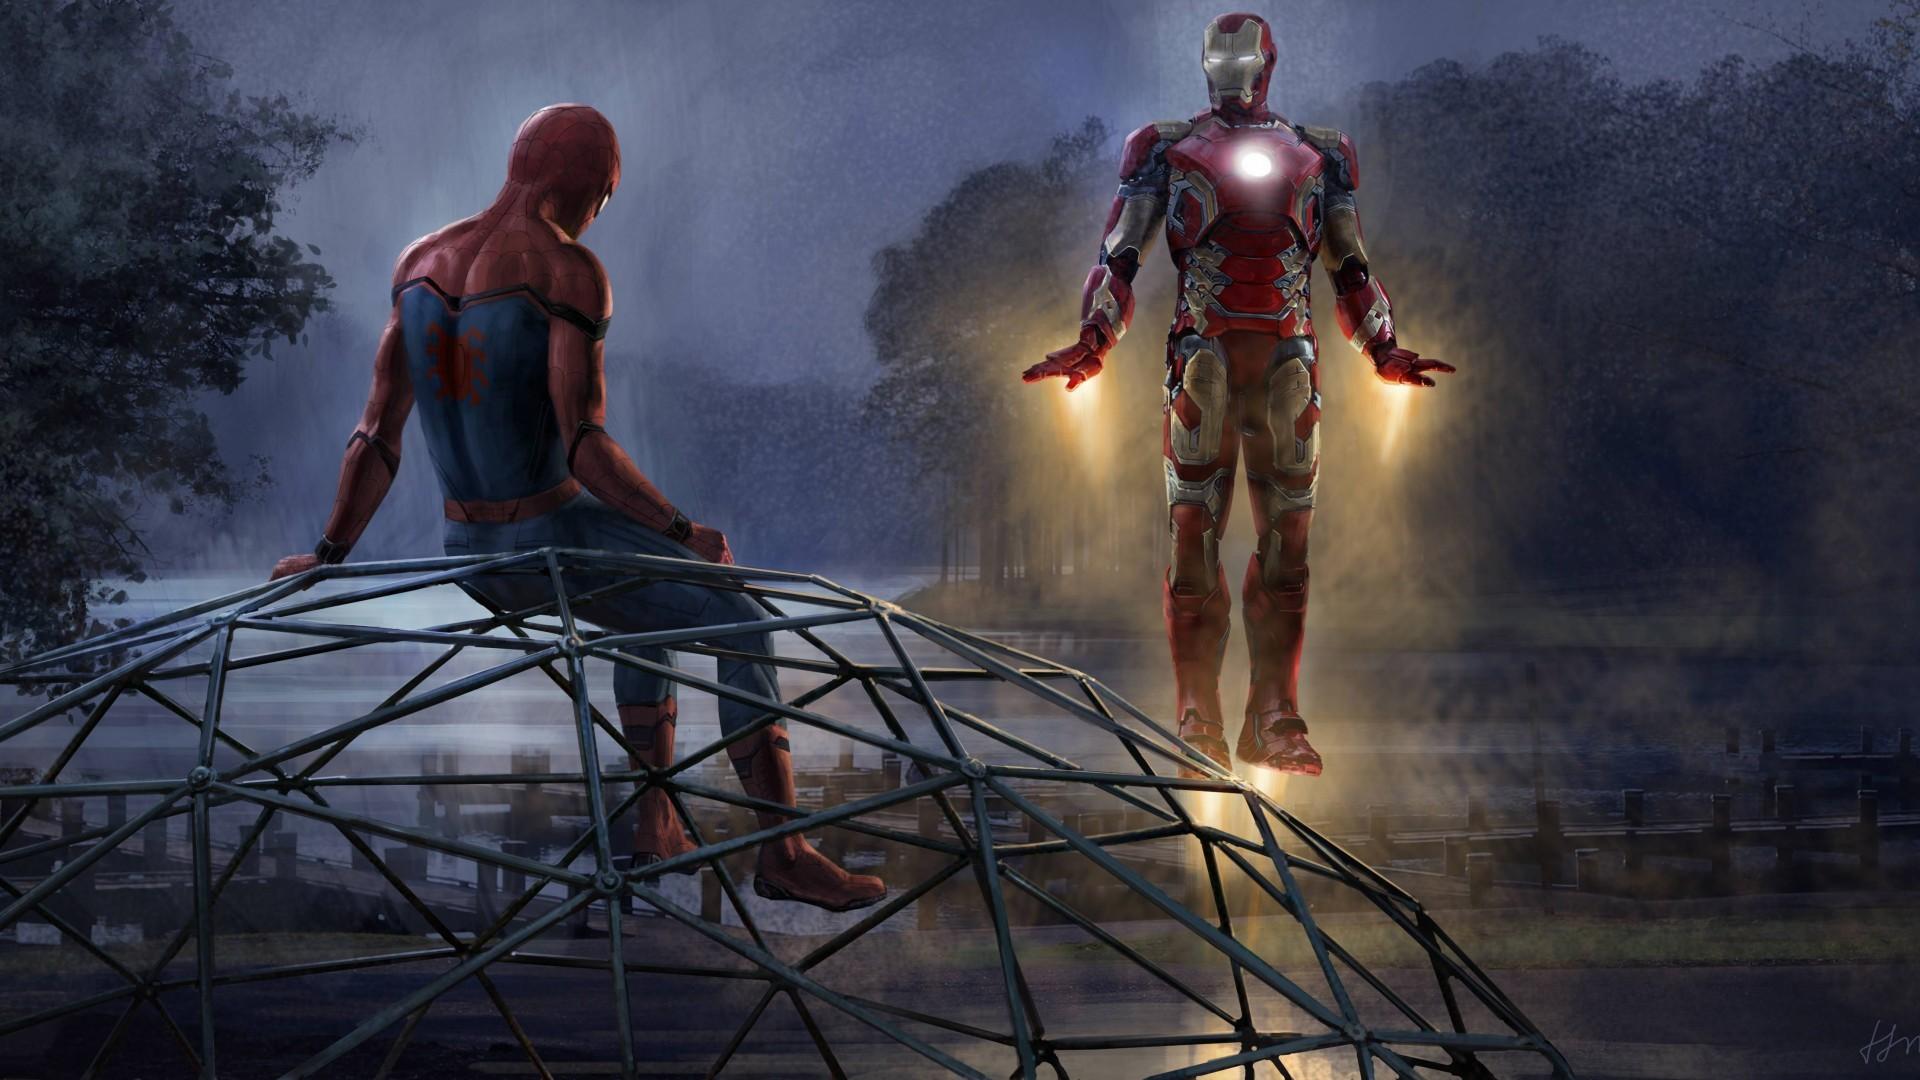 1920x1080 Movies / Iron Man Wallpaper